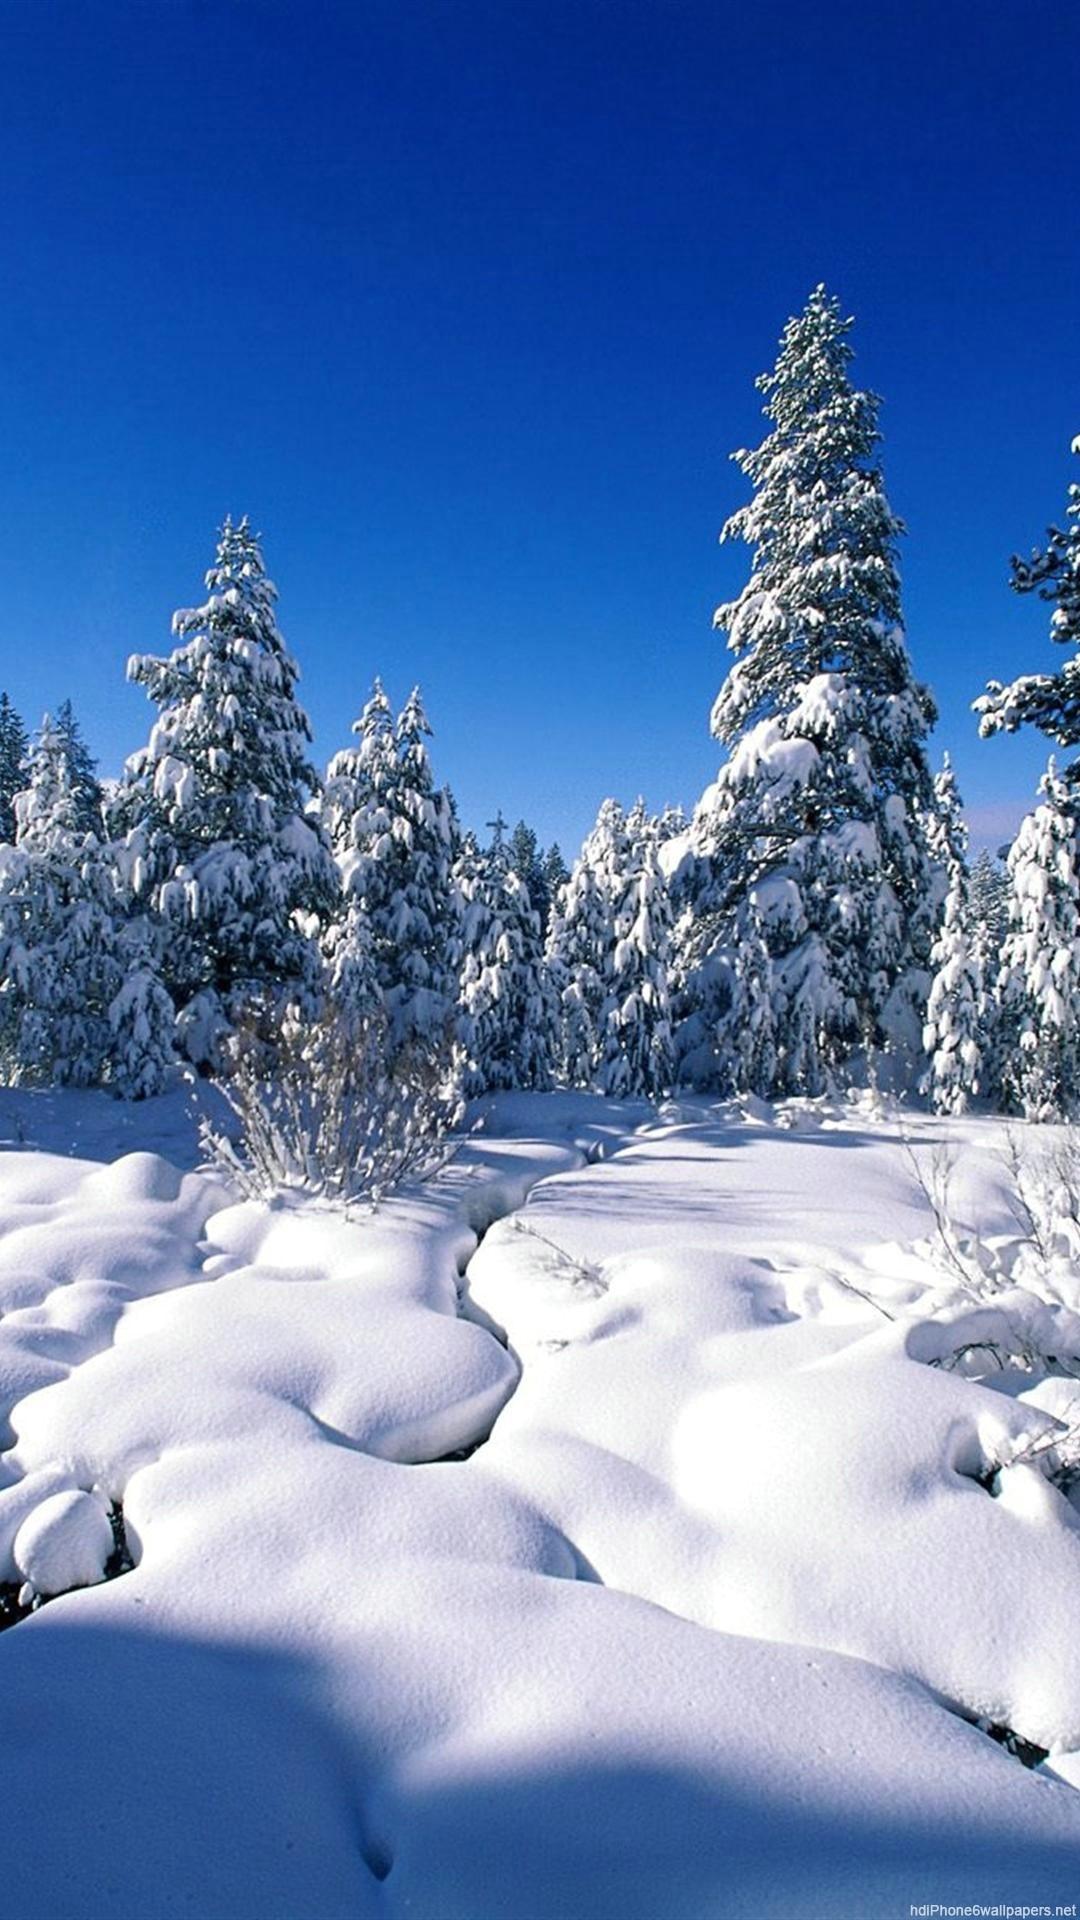 HD winter nature iphone 6 wallpaper